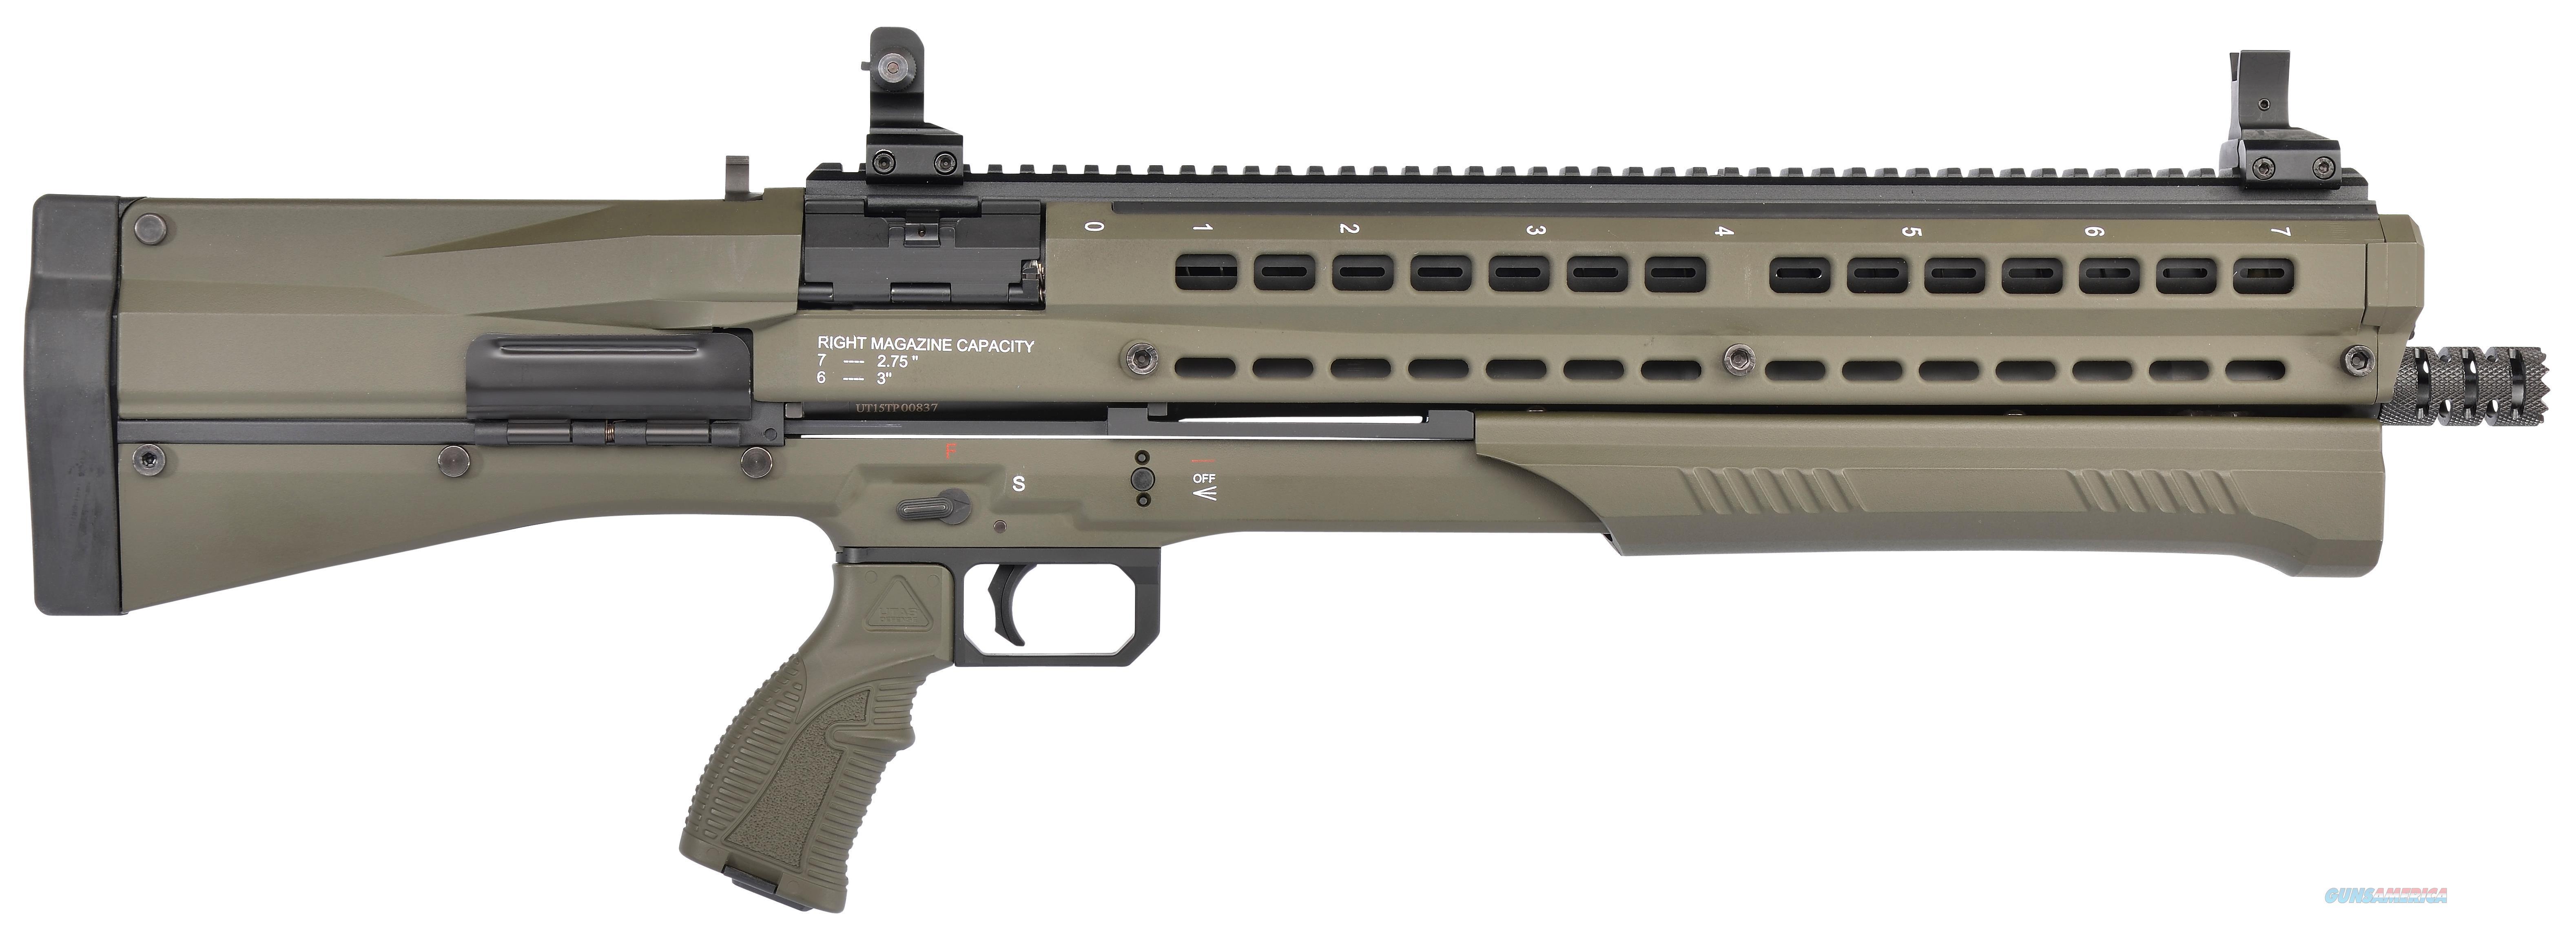 Utas-Usa Ps1od1 Uts-15 Pump 12 Gauge 14+1  Od Green Cerakote PS1OD1  Guns > Shotguns > TU Misc Shotguns